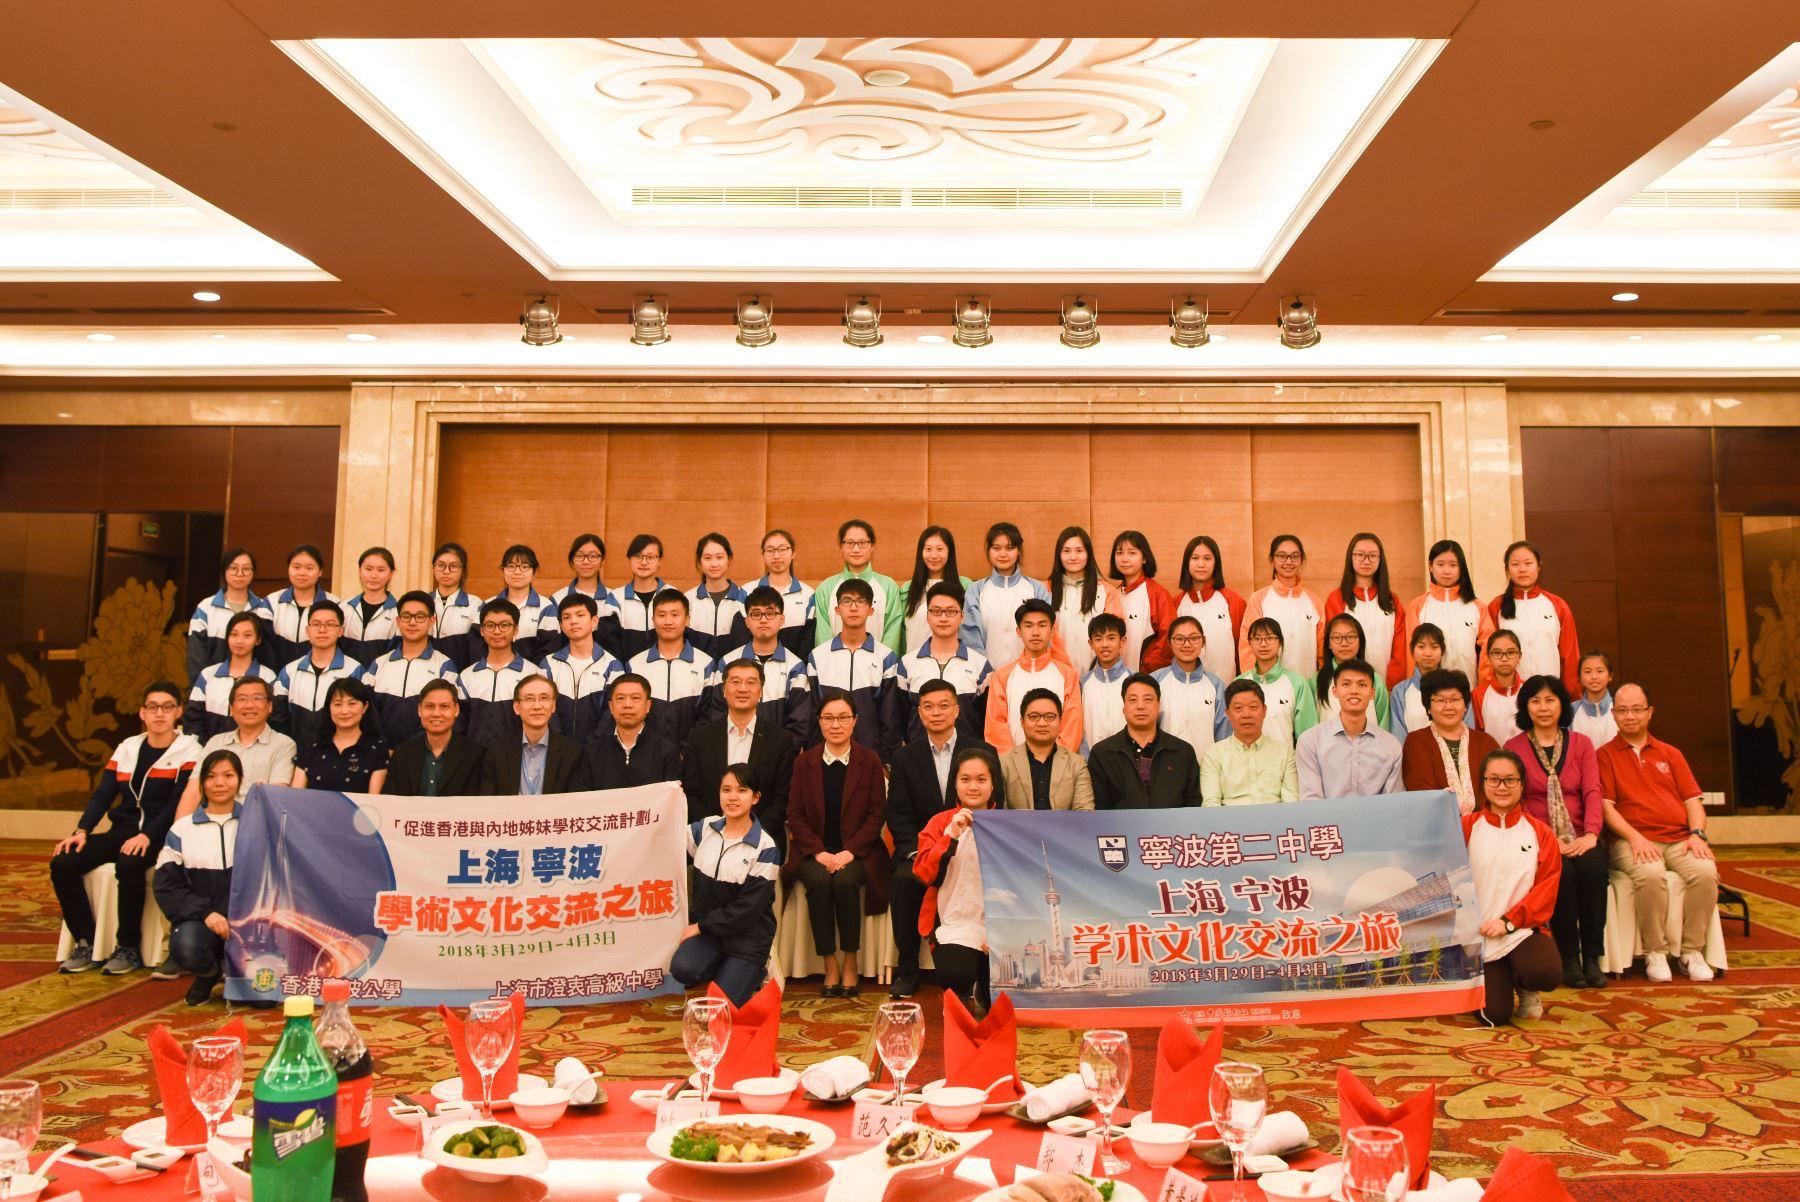 http://npc.edu.hk/sites/default/files/21_48.jpg